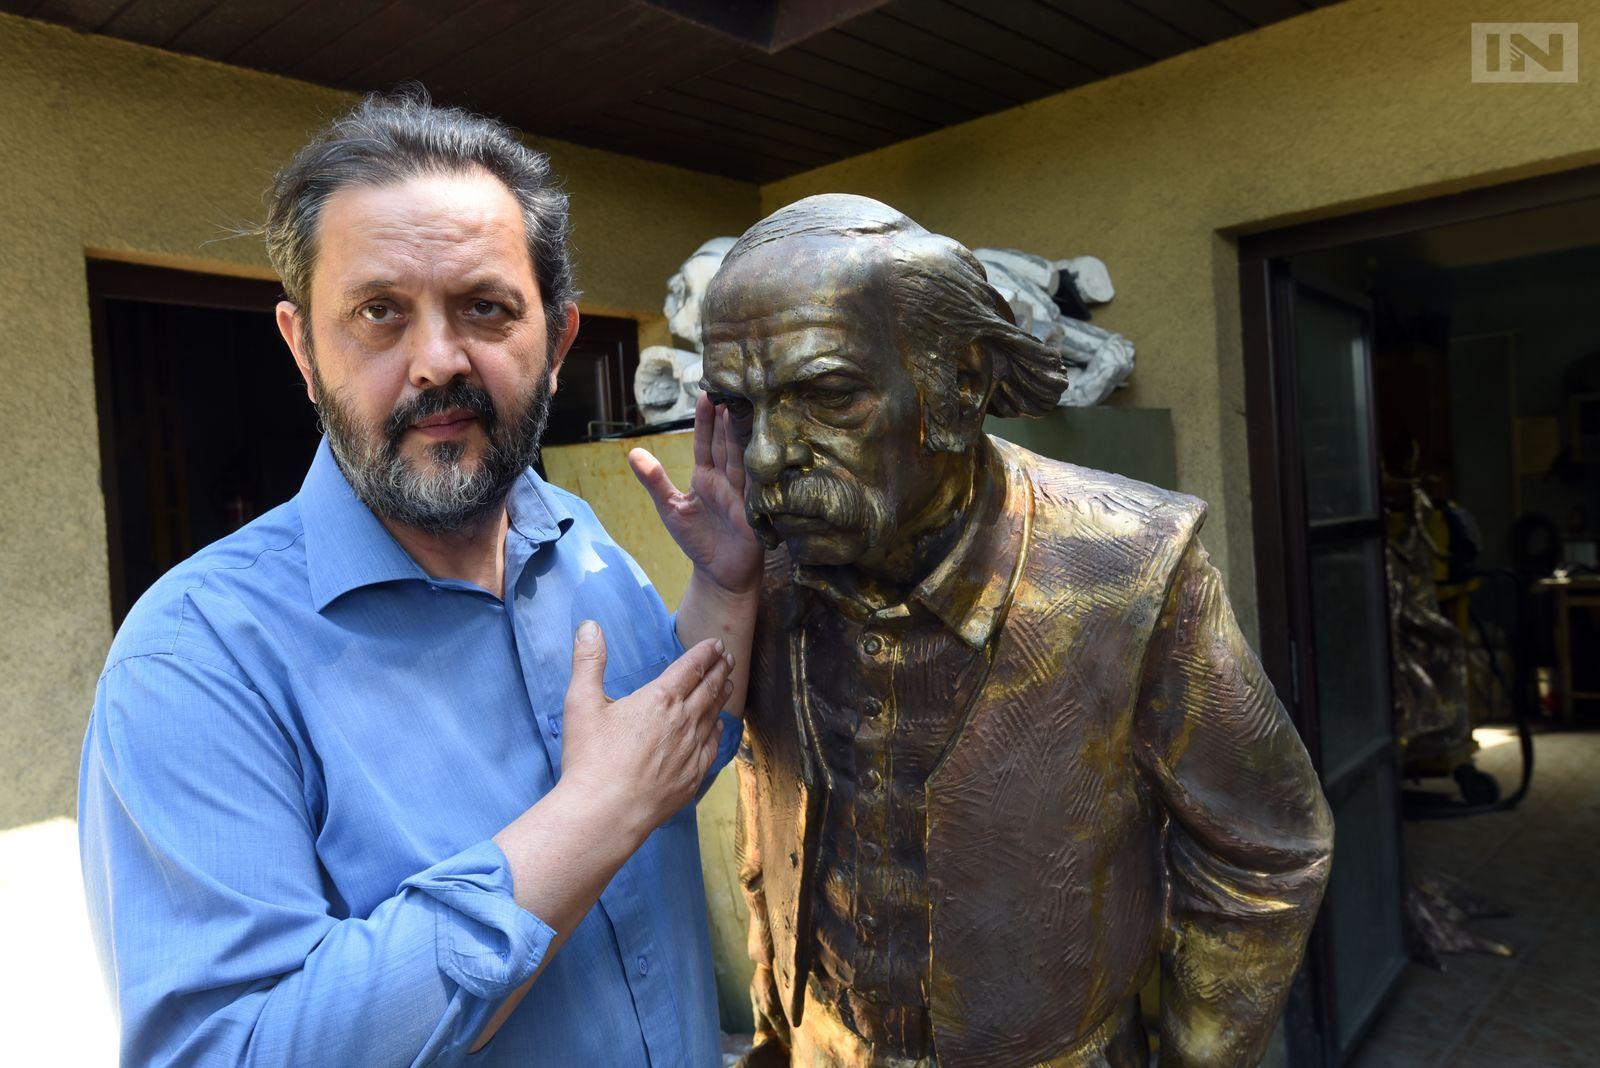 Pomnik Bohdana Smolenia. Co z nim zrobić? Fot. Marek Lasyk – Galerie